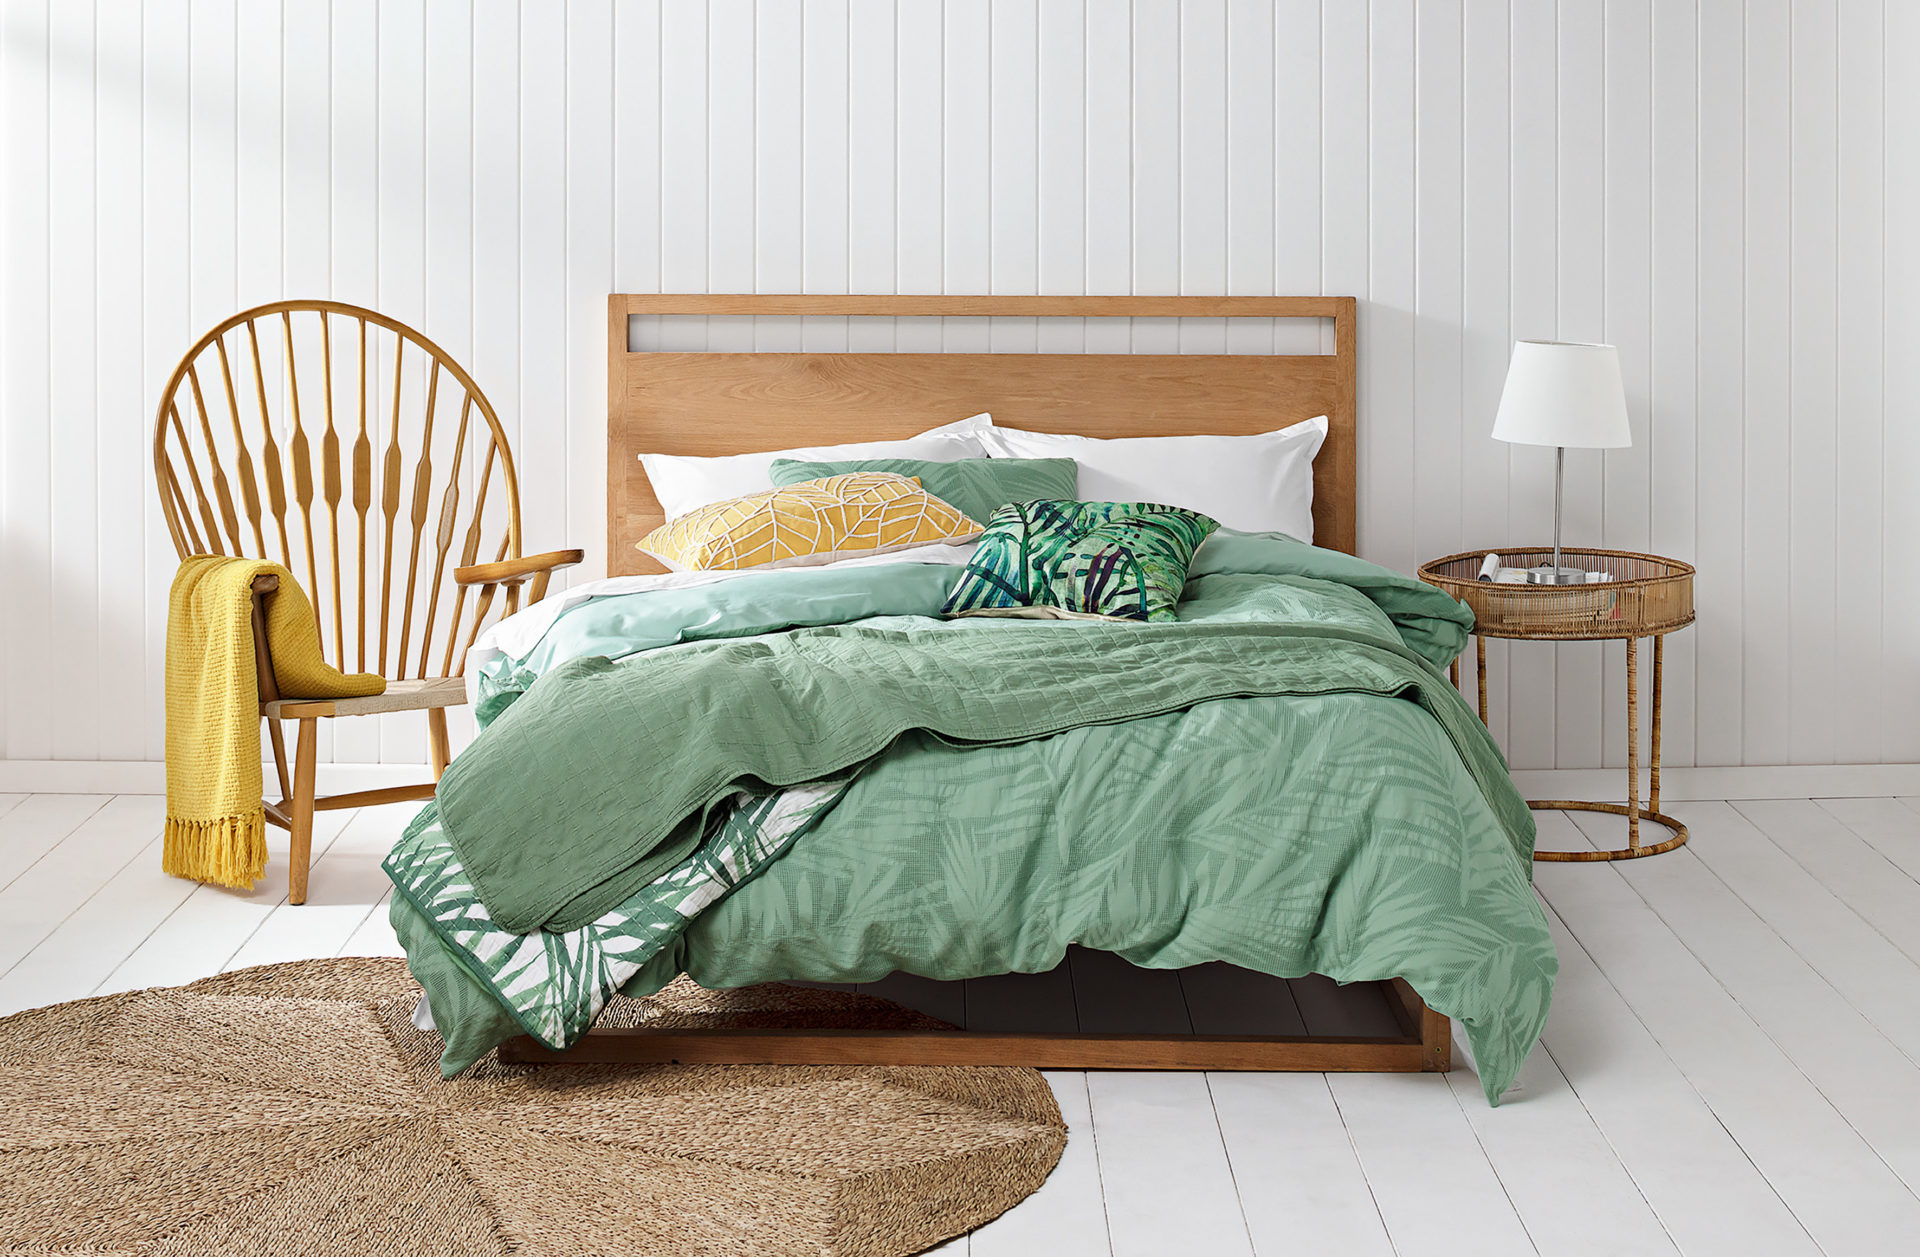 45410_02_WW_homeware_main_range_bedroom_lifestyle_1050__justin patrick_decor shoot_cape town_